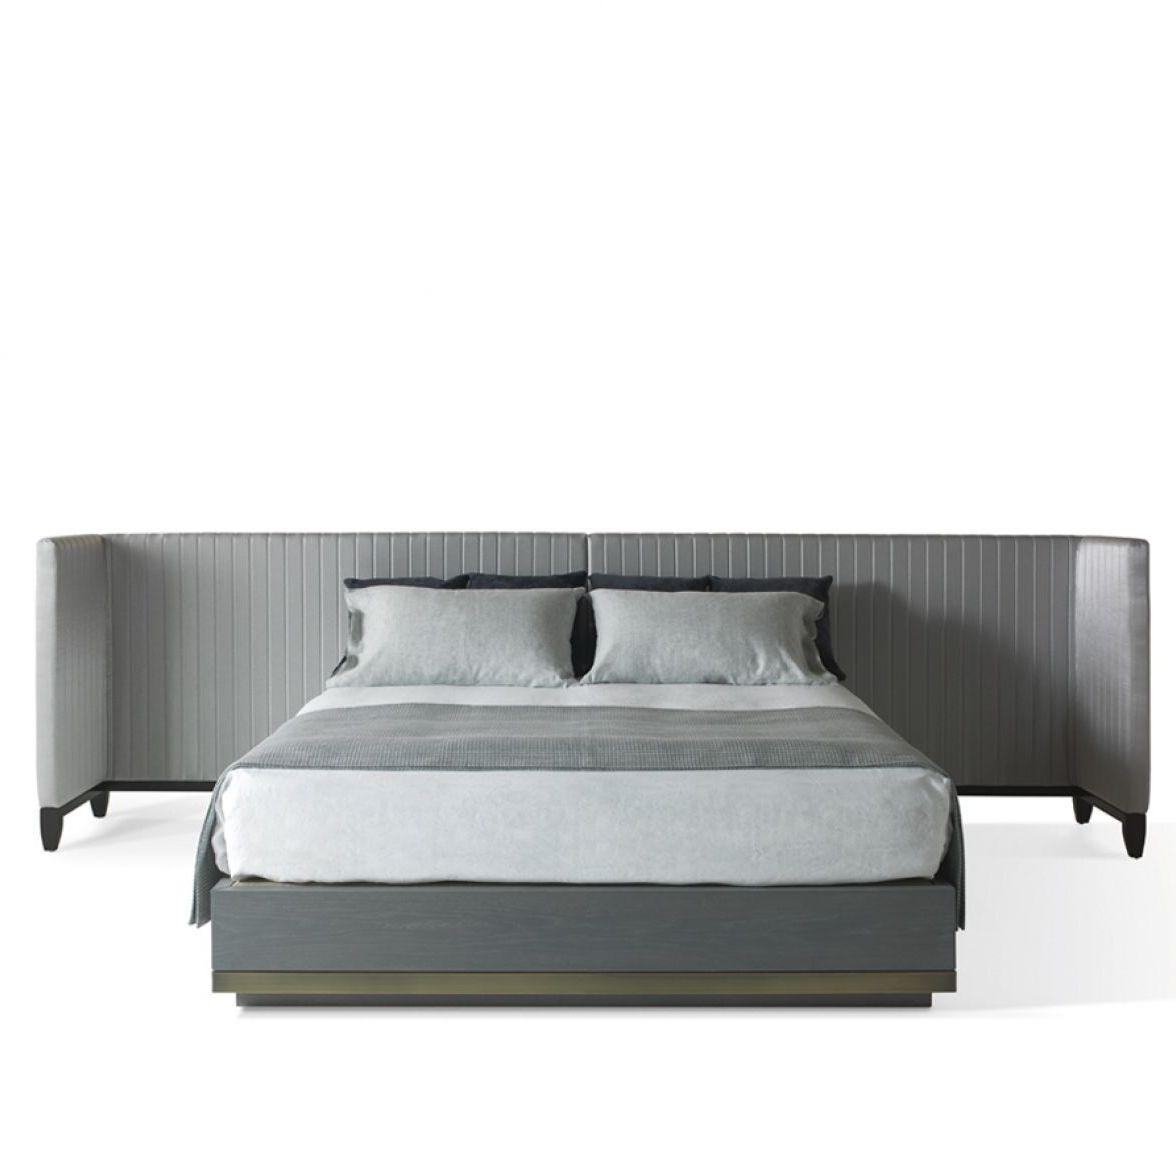 Streng Bed фото цена